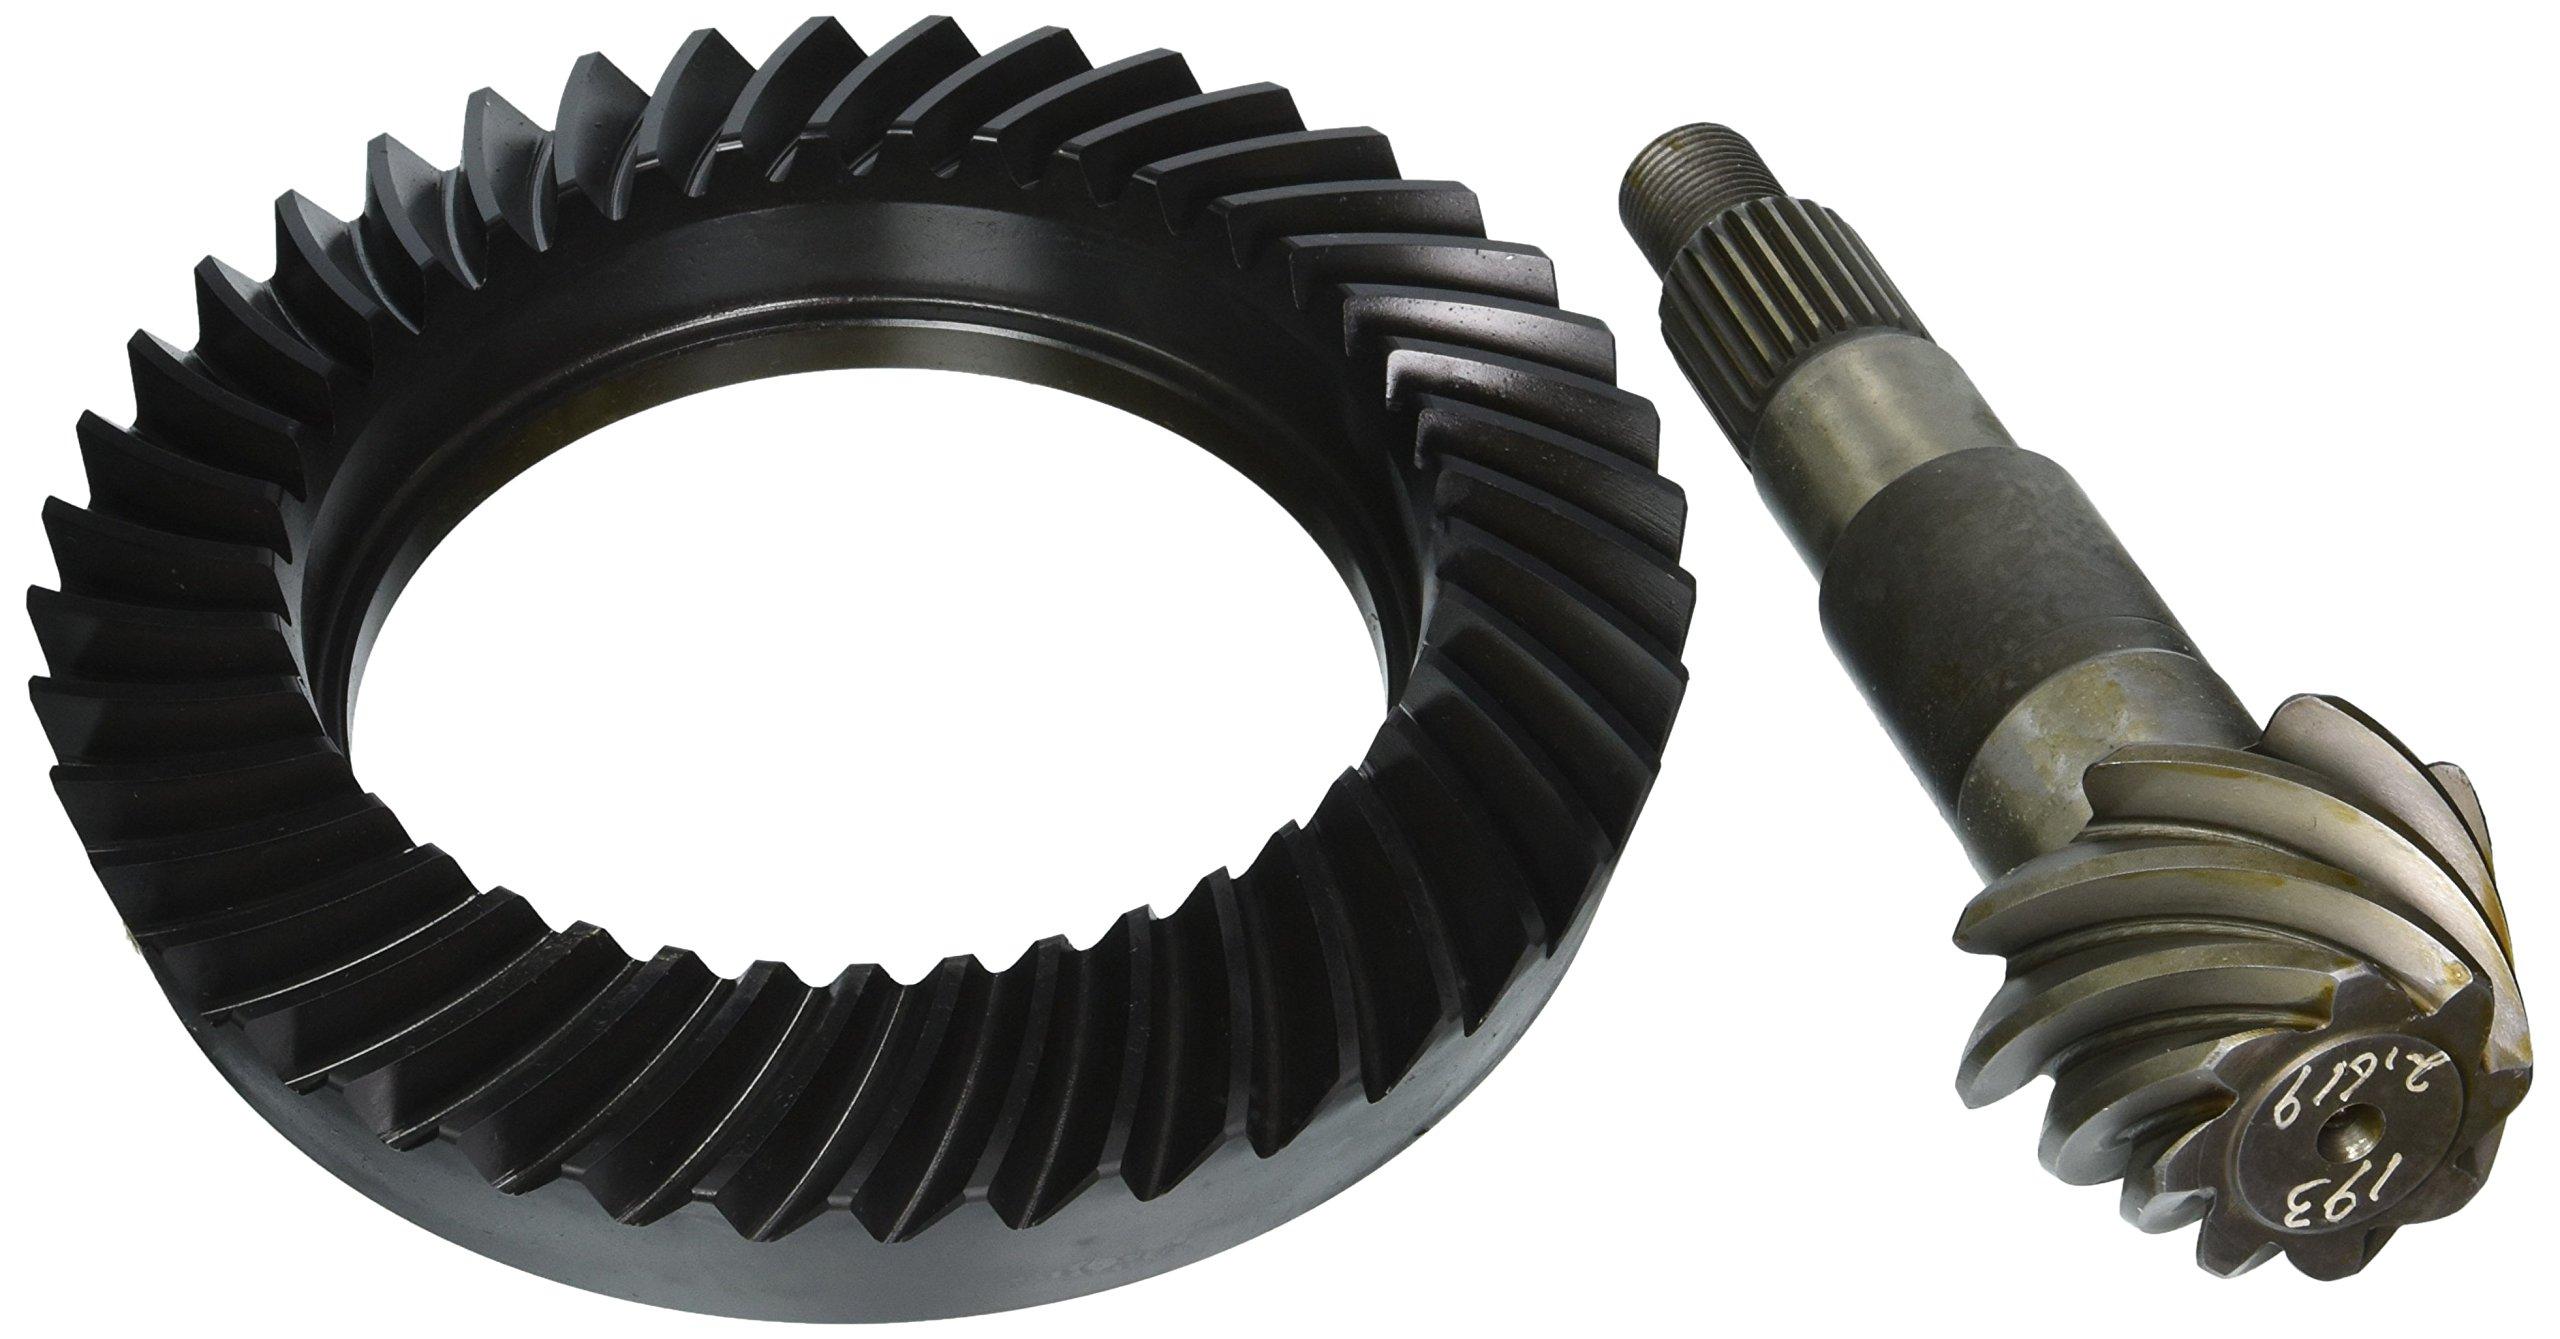 Motive Gear (D44-513JK) Performance Ring and Pinion Differential Set, Dana 44 JK Rear, 41-8 Teeth, 5.13 Ratio by Motive Gear